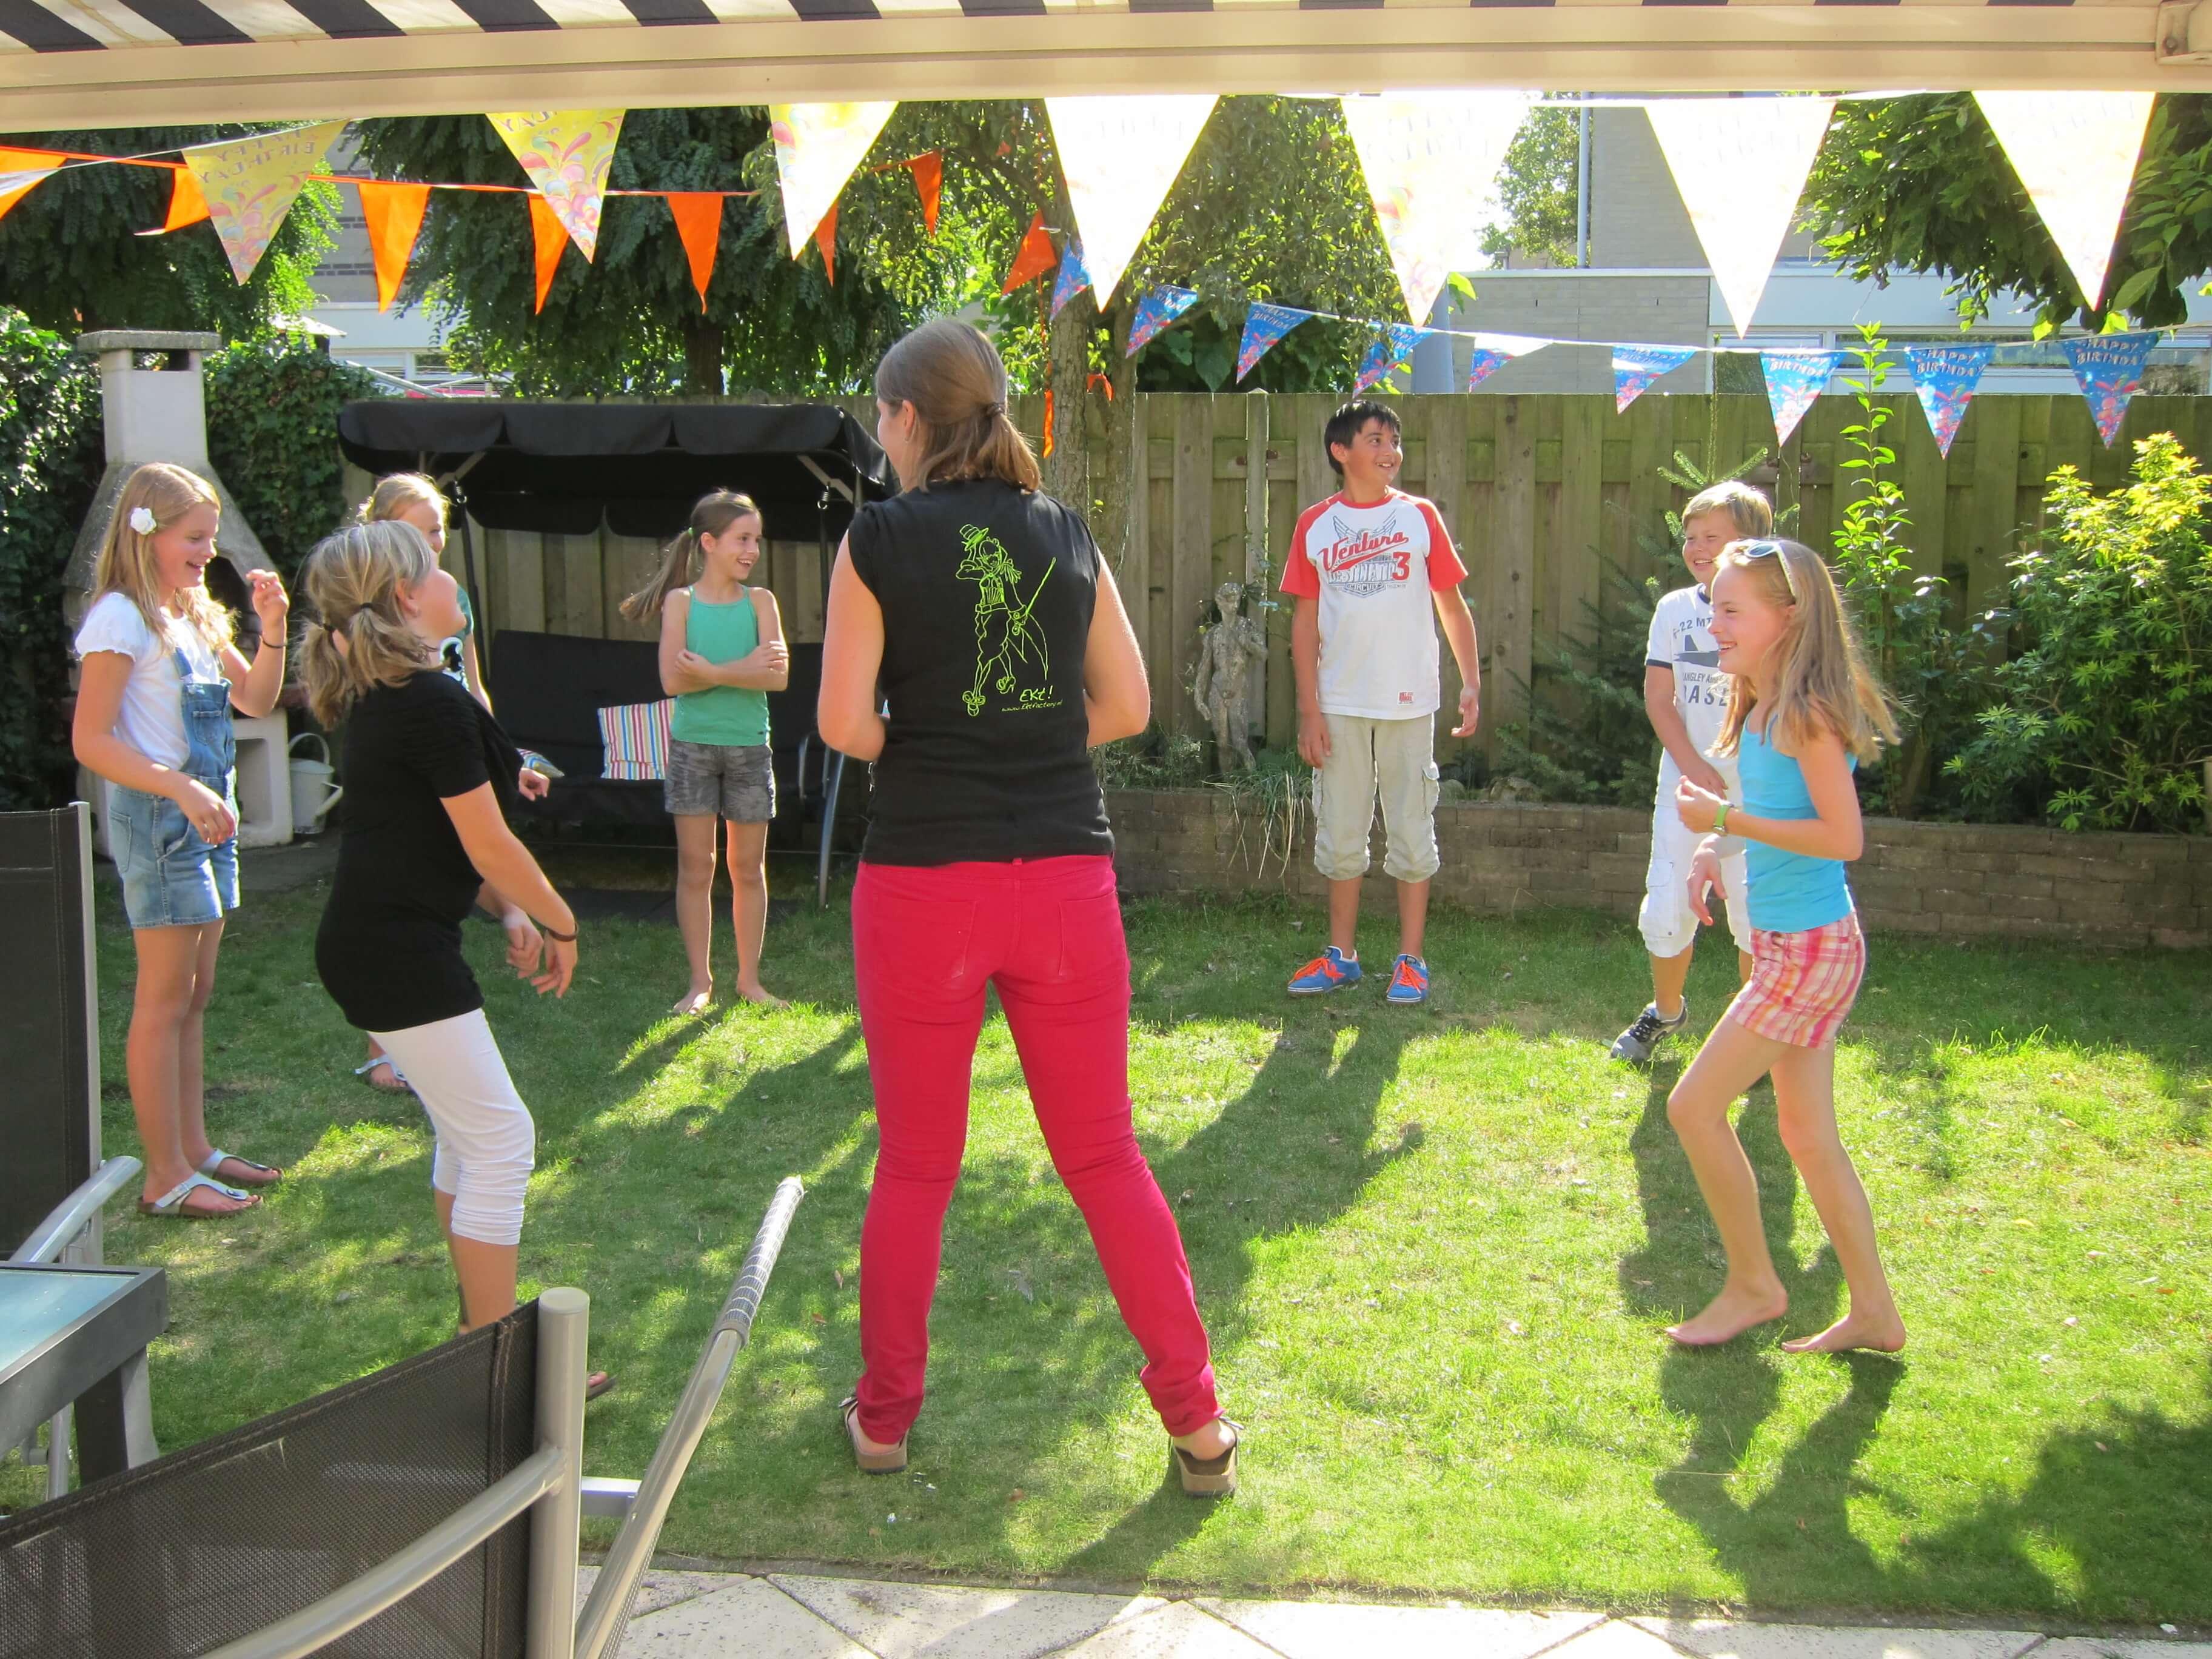 Ekt! Eigenwijs Kindertheater in Den Bosch